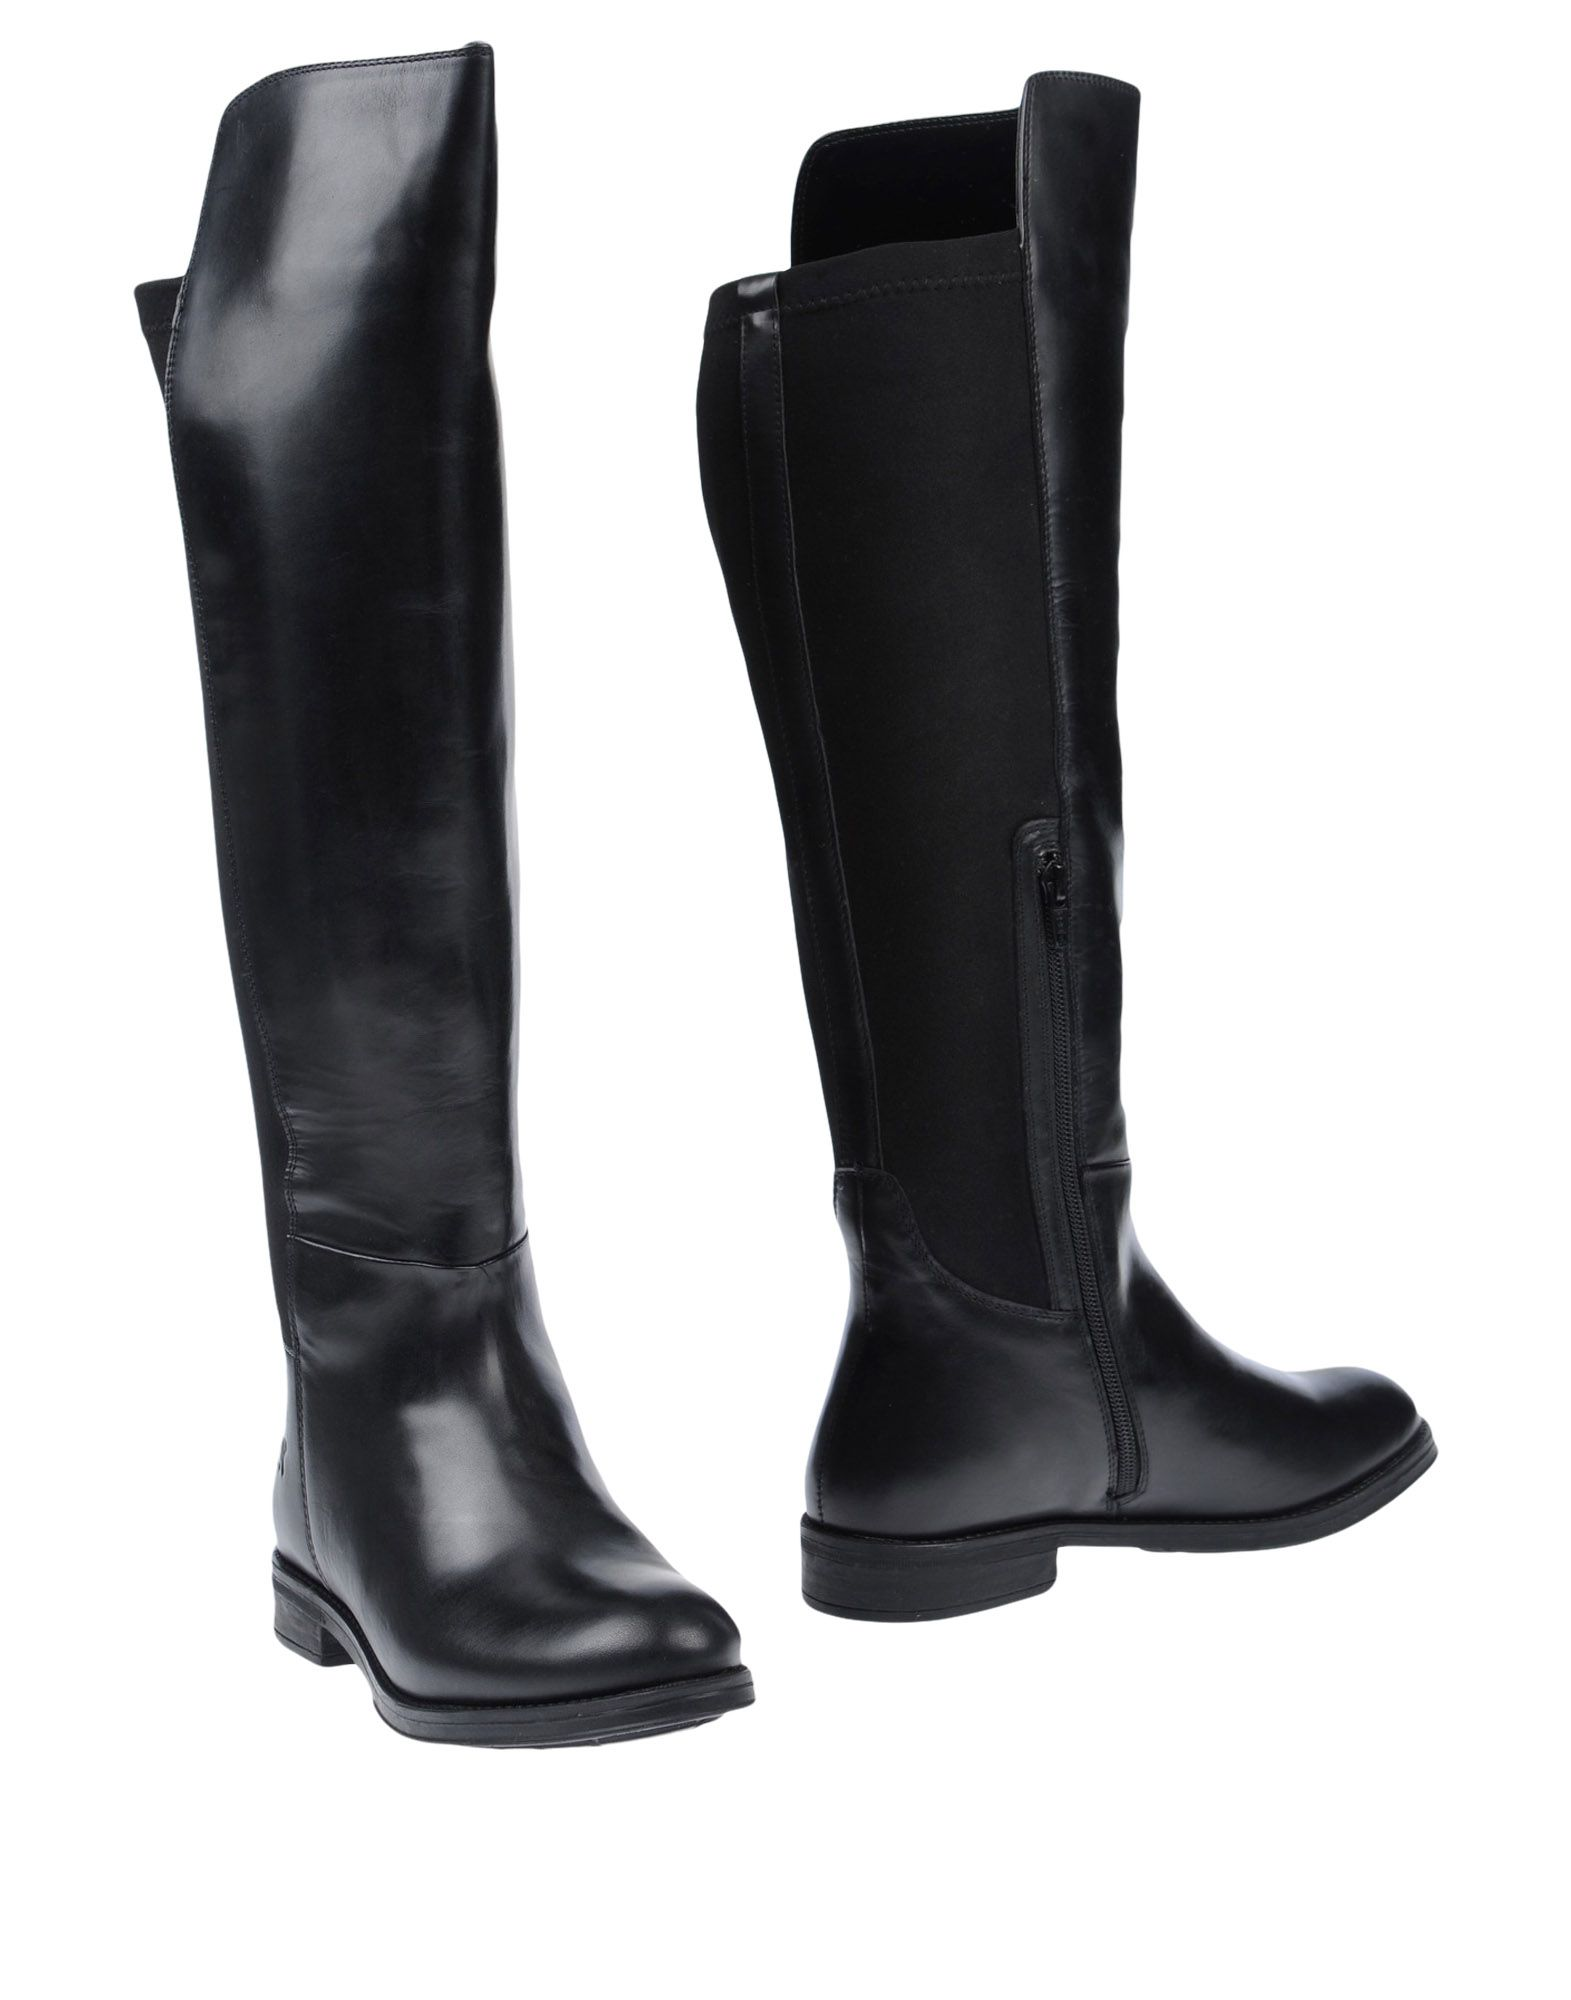 Lumberjack Stiefel Damen  11505525CP Gute Qualität beliebte Schuhe